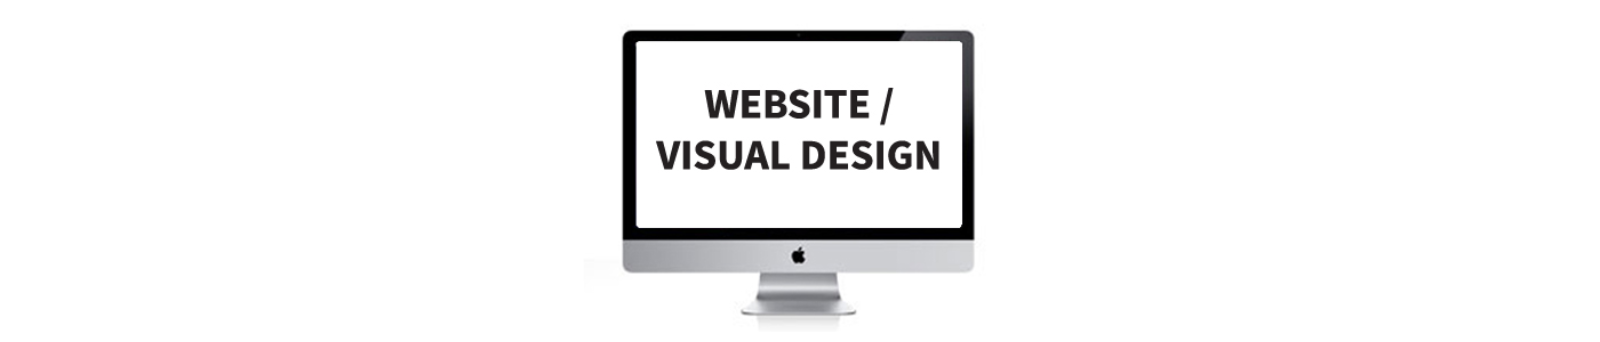 Website/ Visual Design 网站与视觉设计